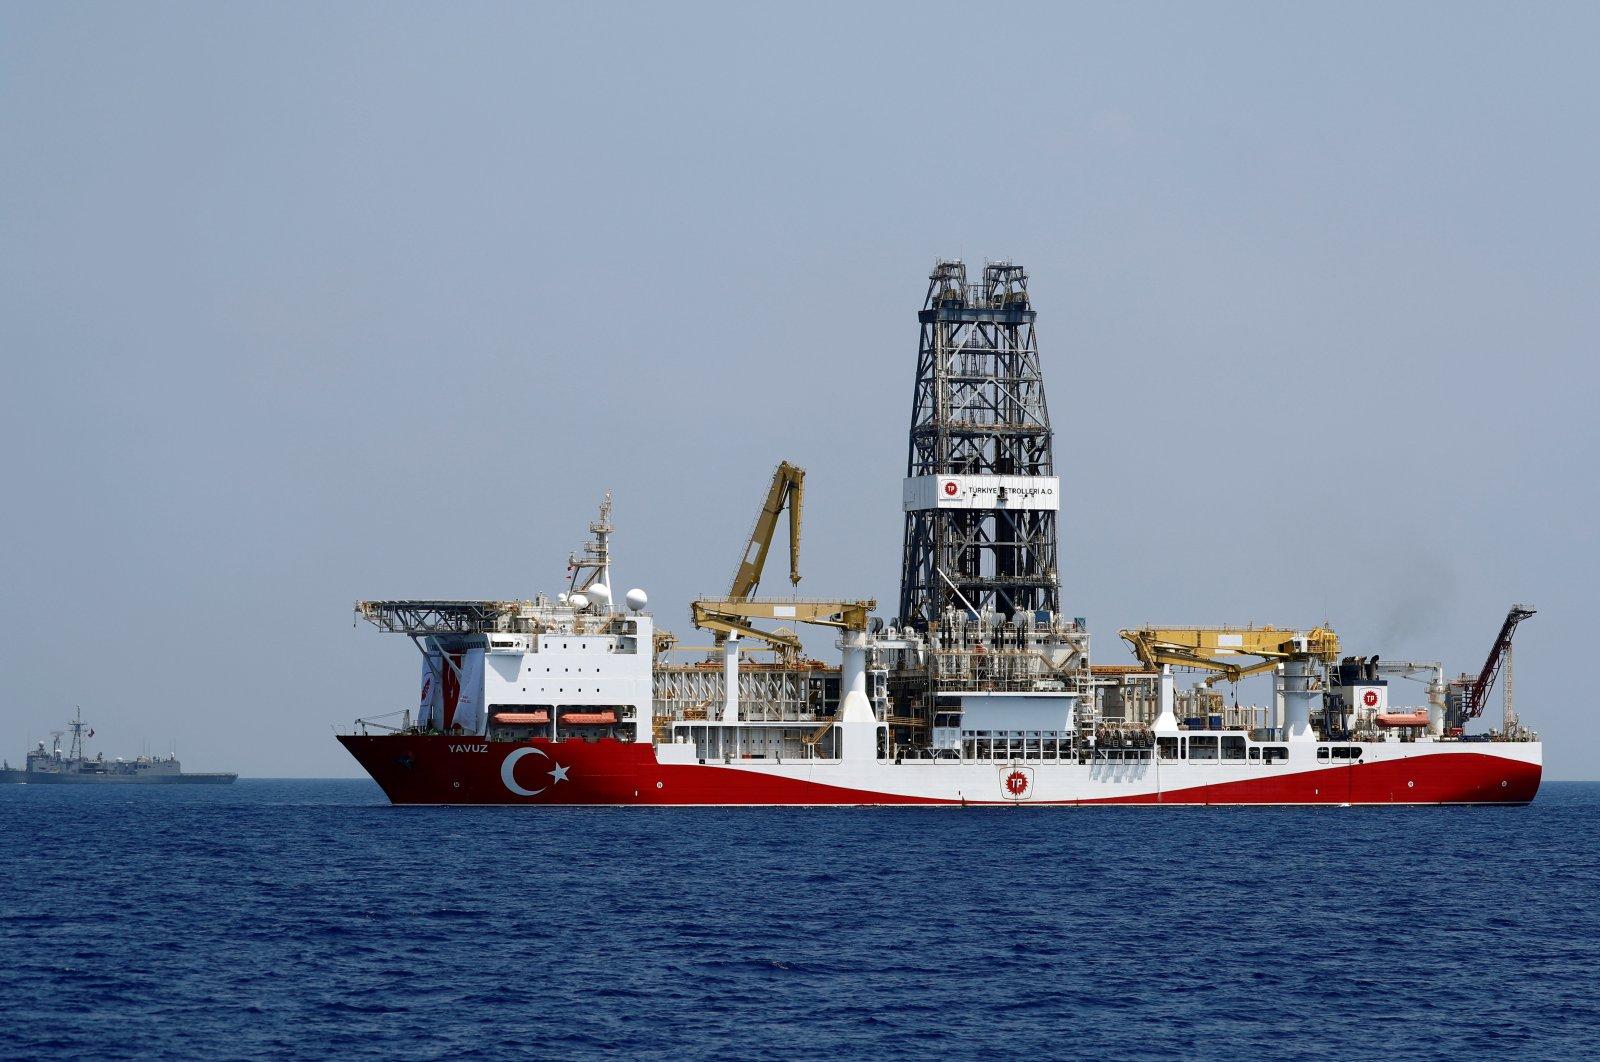 The Turkish drilling vessel, Yavuz, is escorted by Turkish navy frigate TCG Gemlik (F-492) in the Eastern Mediterranean Sea off the island of Cyprus, Aug. 6, 2019. (Reuters Photo)